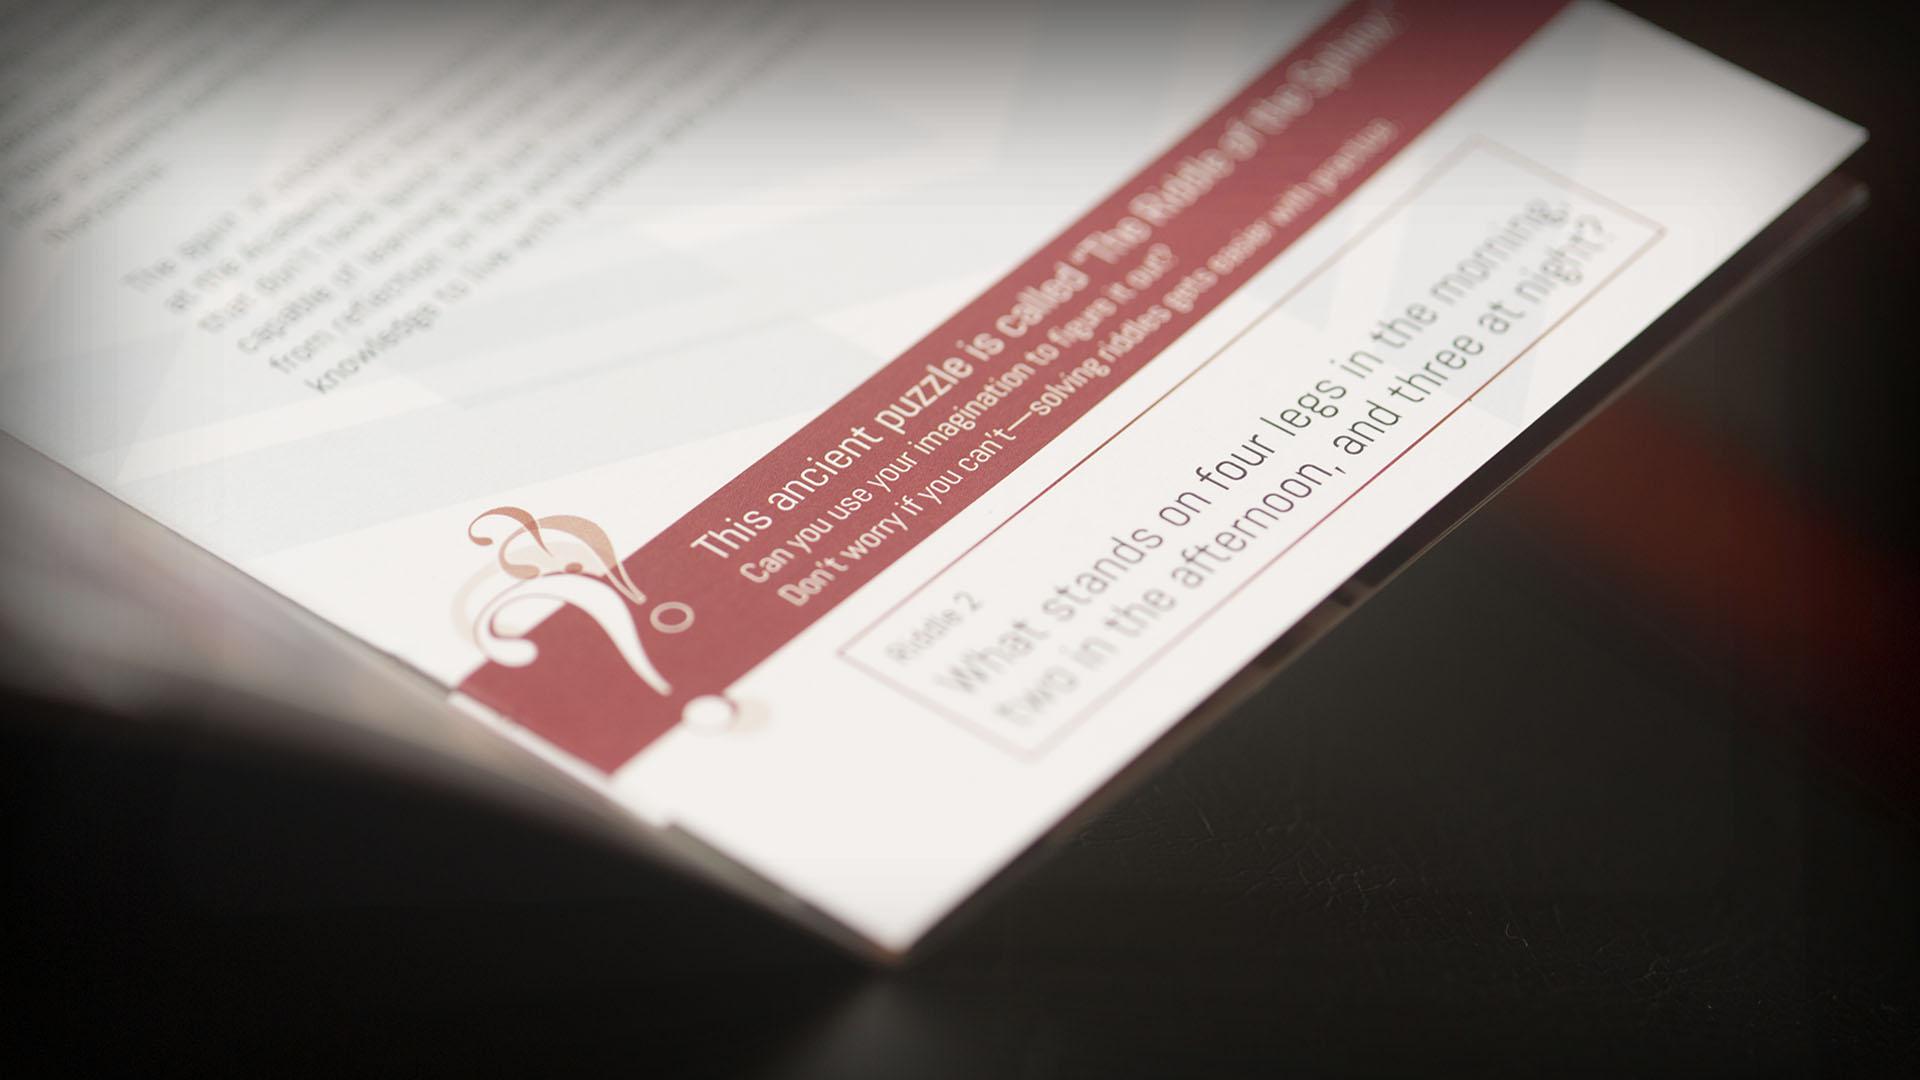 Albuquerque-Academy-Branding-Marketing-Admissions-Campaign-Mini-Viewbook-5.jpg